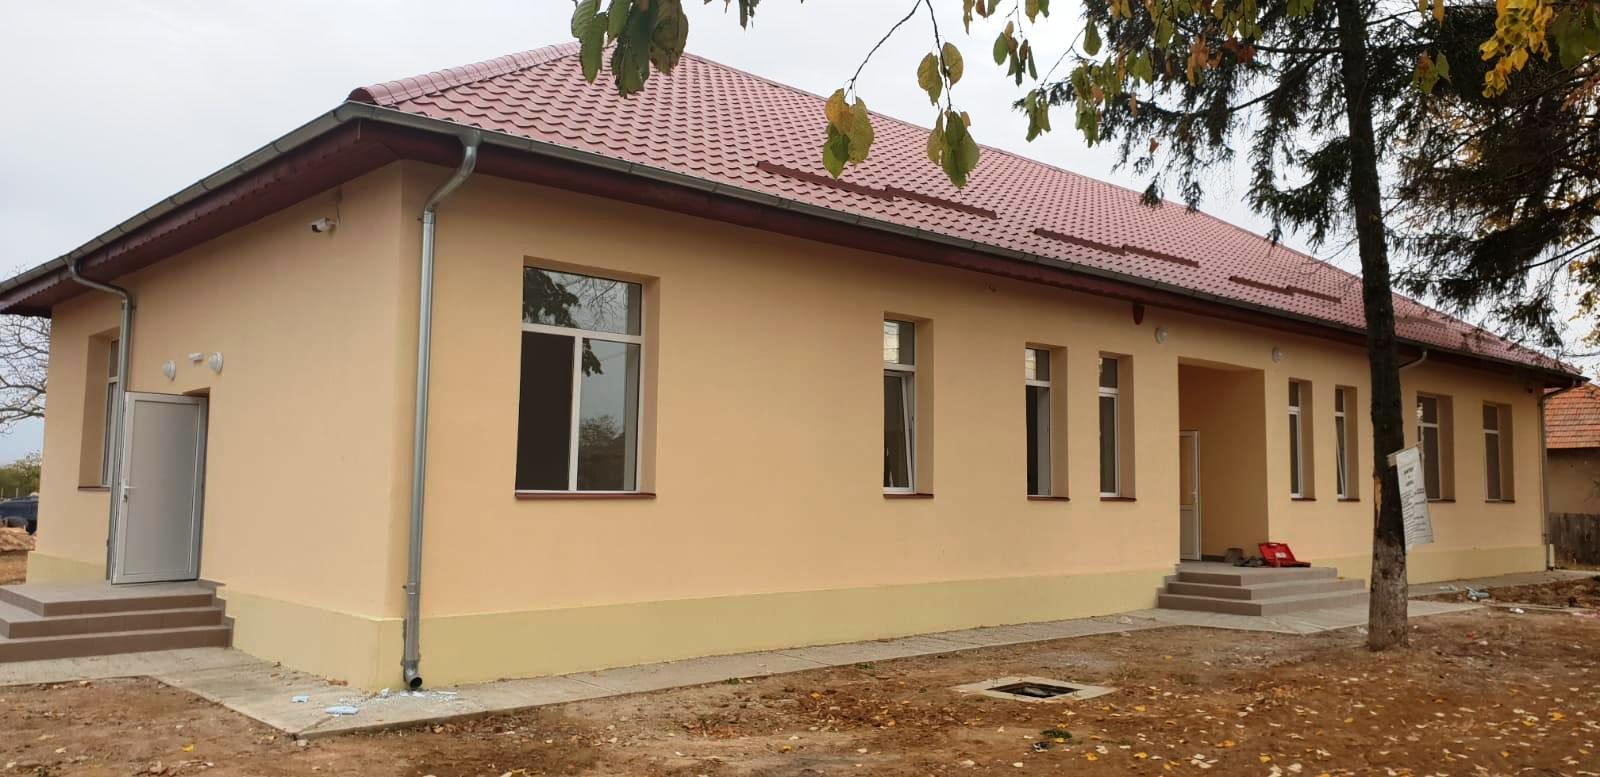 Reabilitare si modernizare scoala Cioroboreni ,Comuna Jiana ,judetul Mehedinti